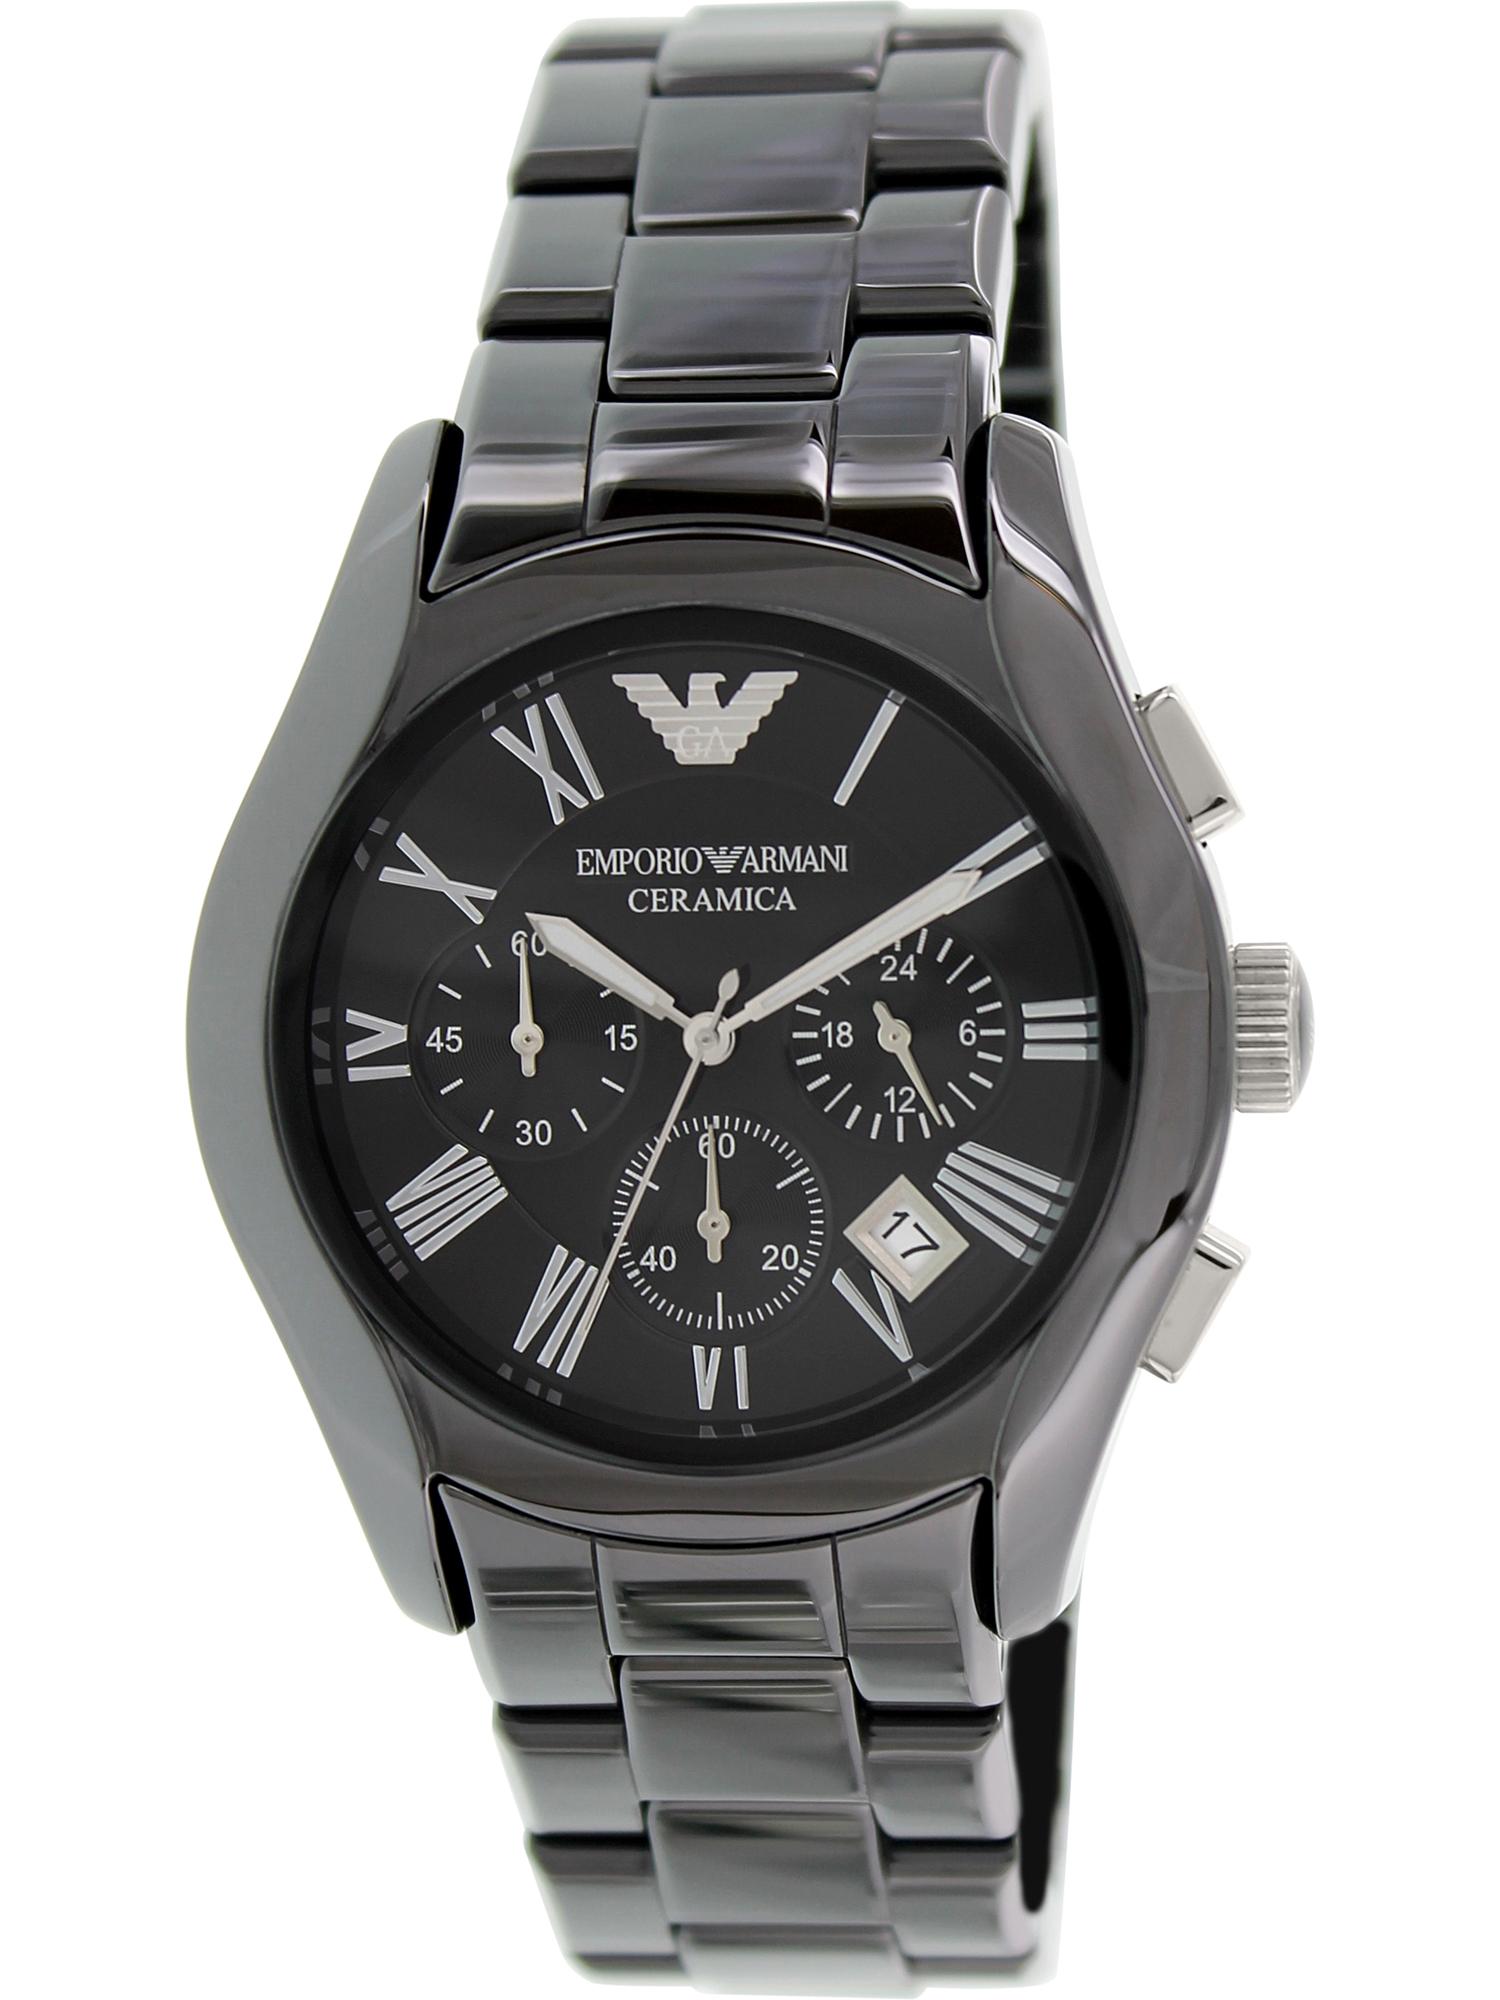 Emporio Armani Men's Ceramica Black Ceramic Analog Quartz Fashion Watch AR1400